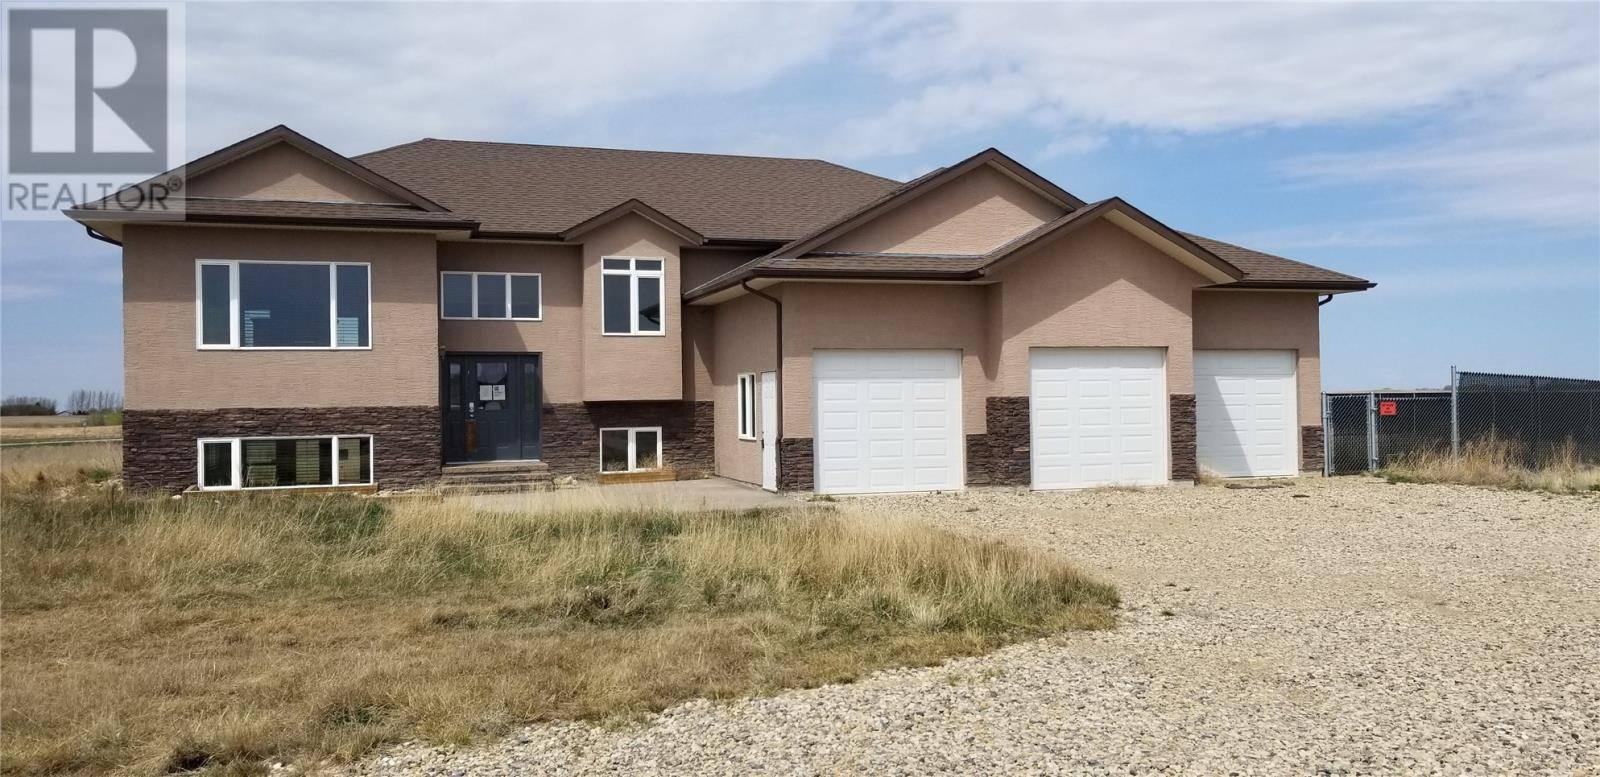 House for sale at 31 Draeger Rd Aberdeen Rm No. 373 Saskatchewan - MLS: SK766815